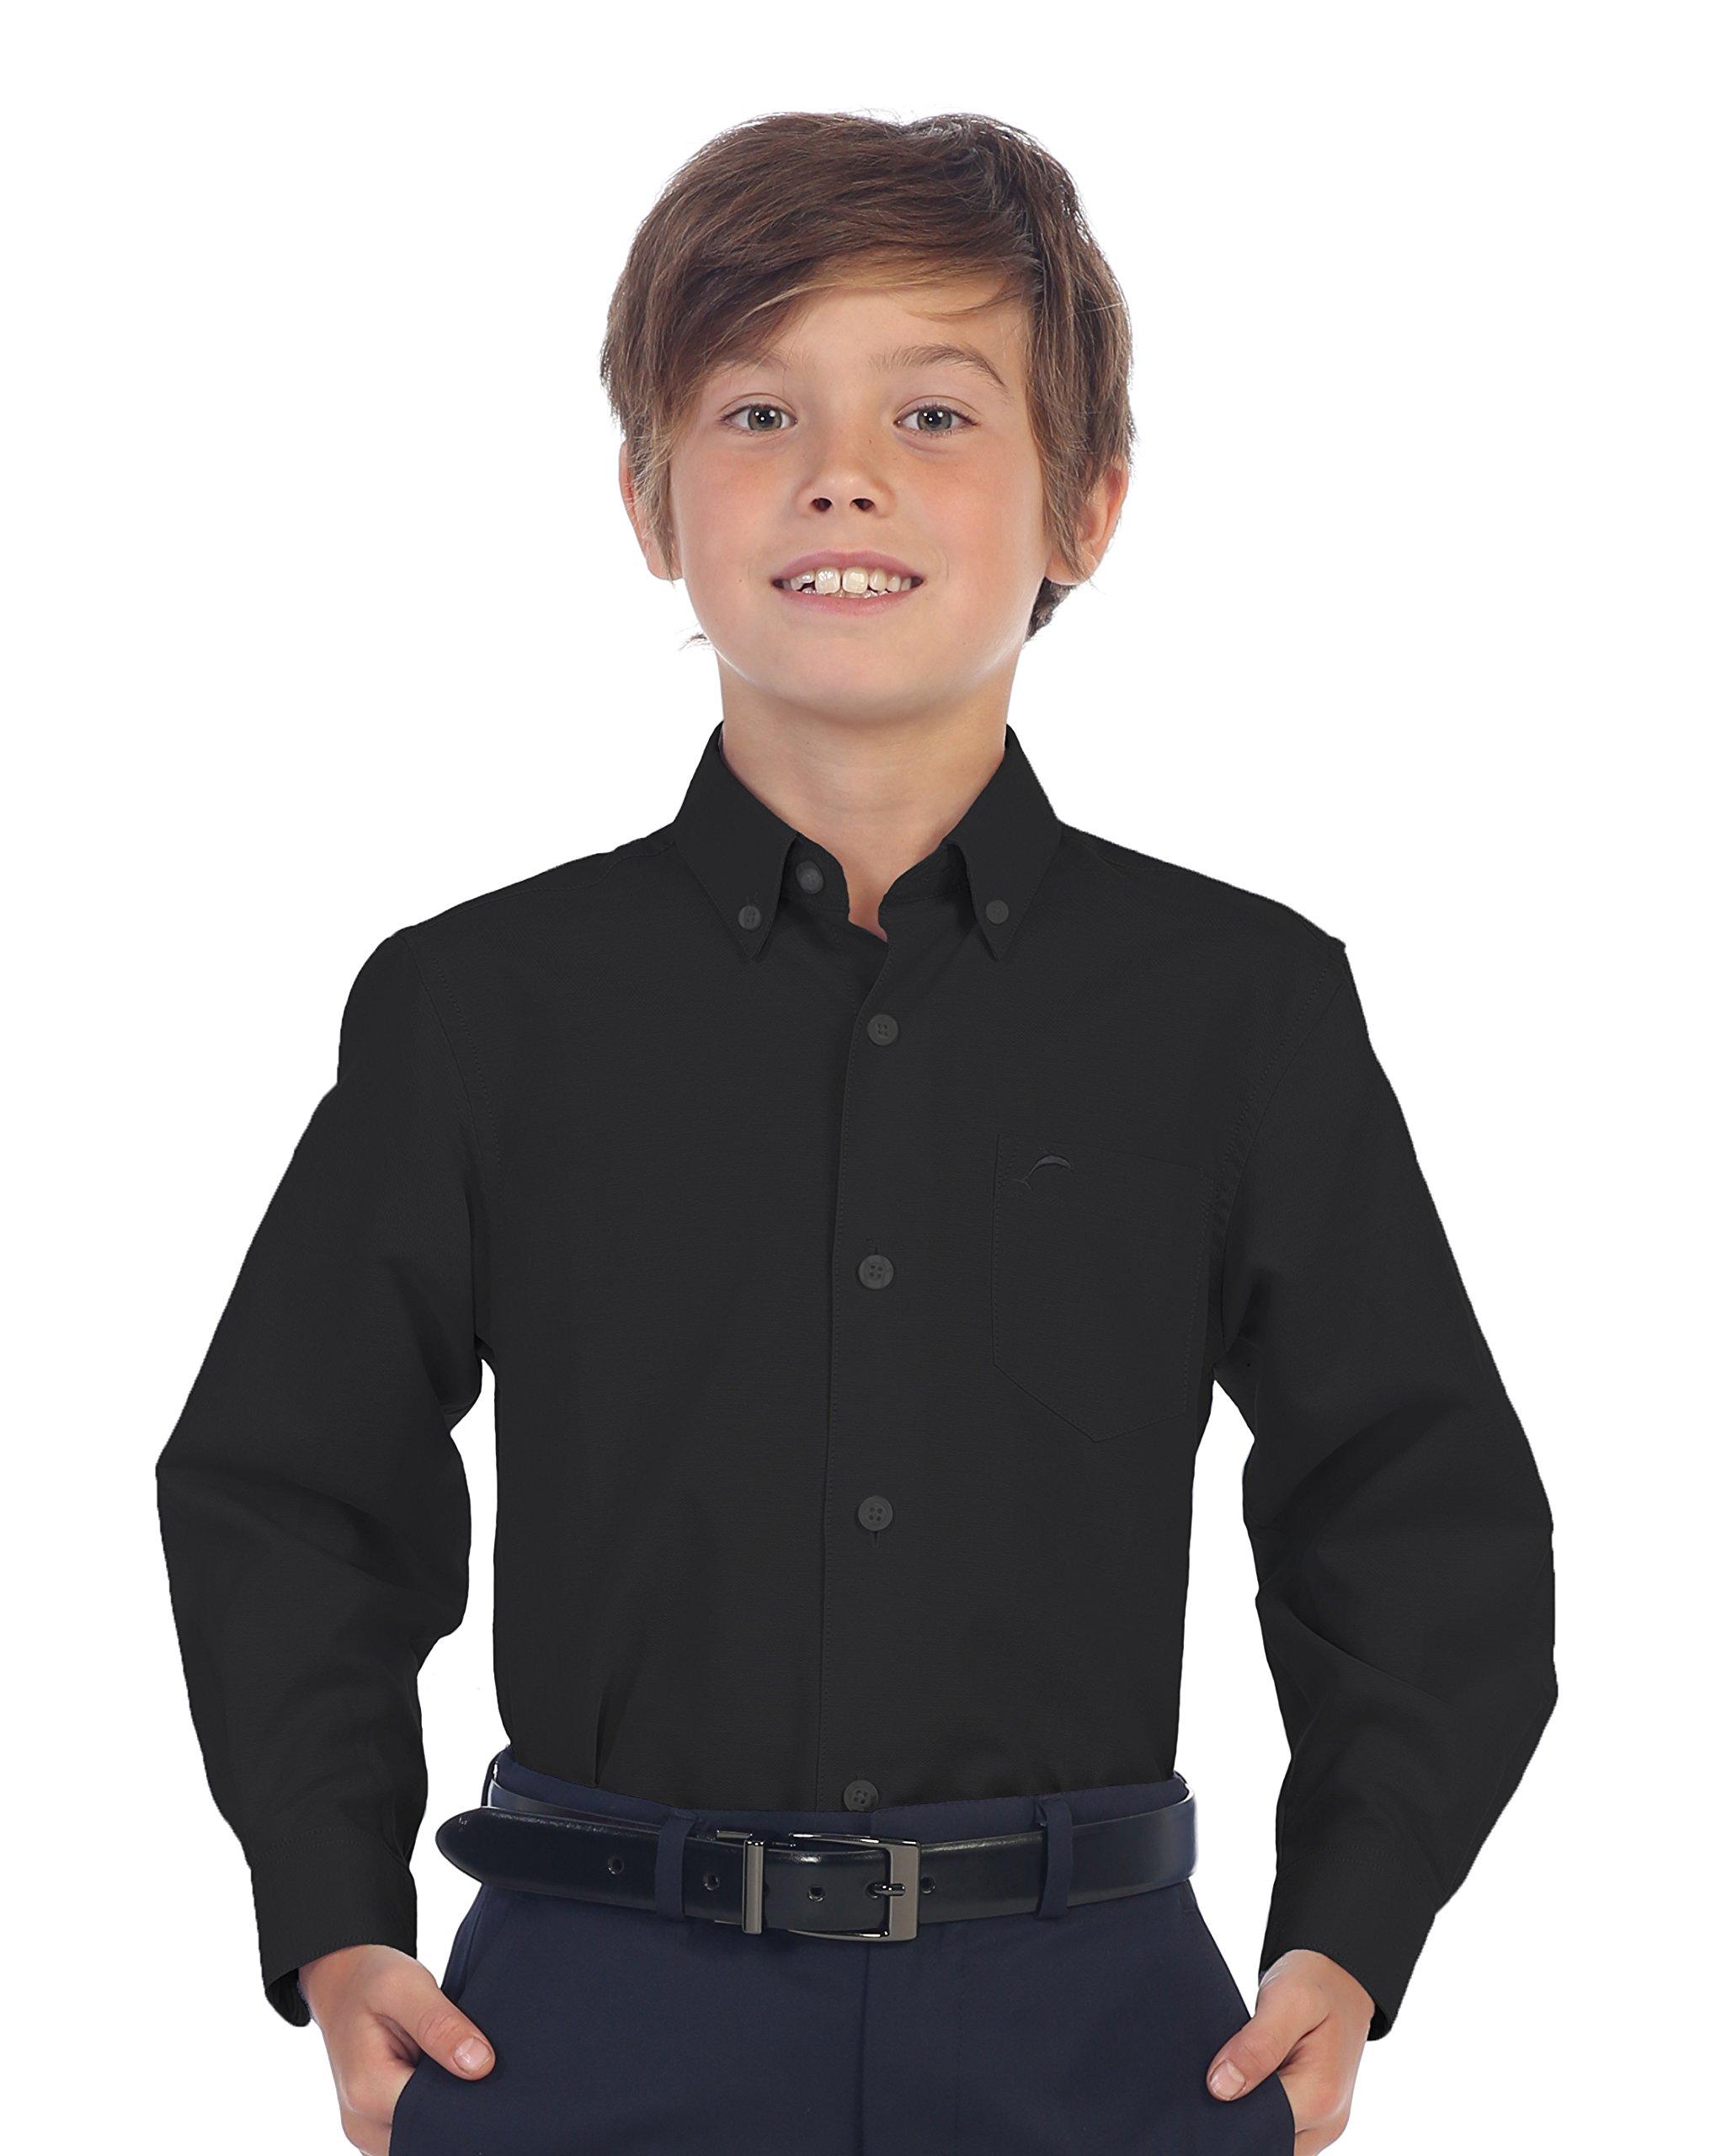 Gioberti Boy's Oxford Long Sleeve Dress Shirt, Black, Size 4